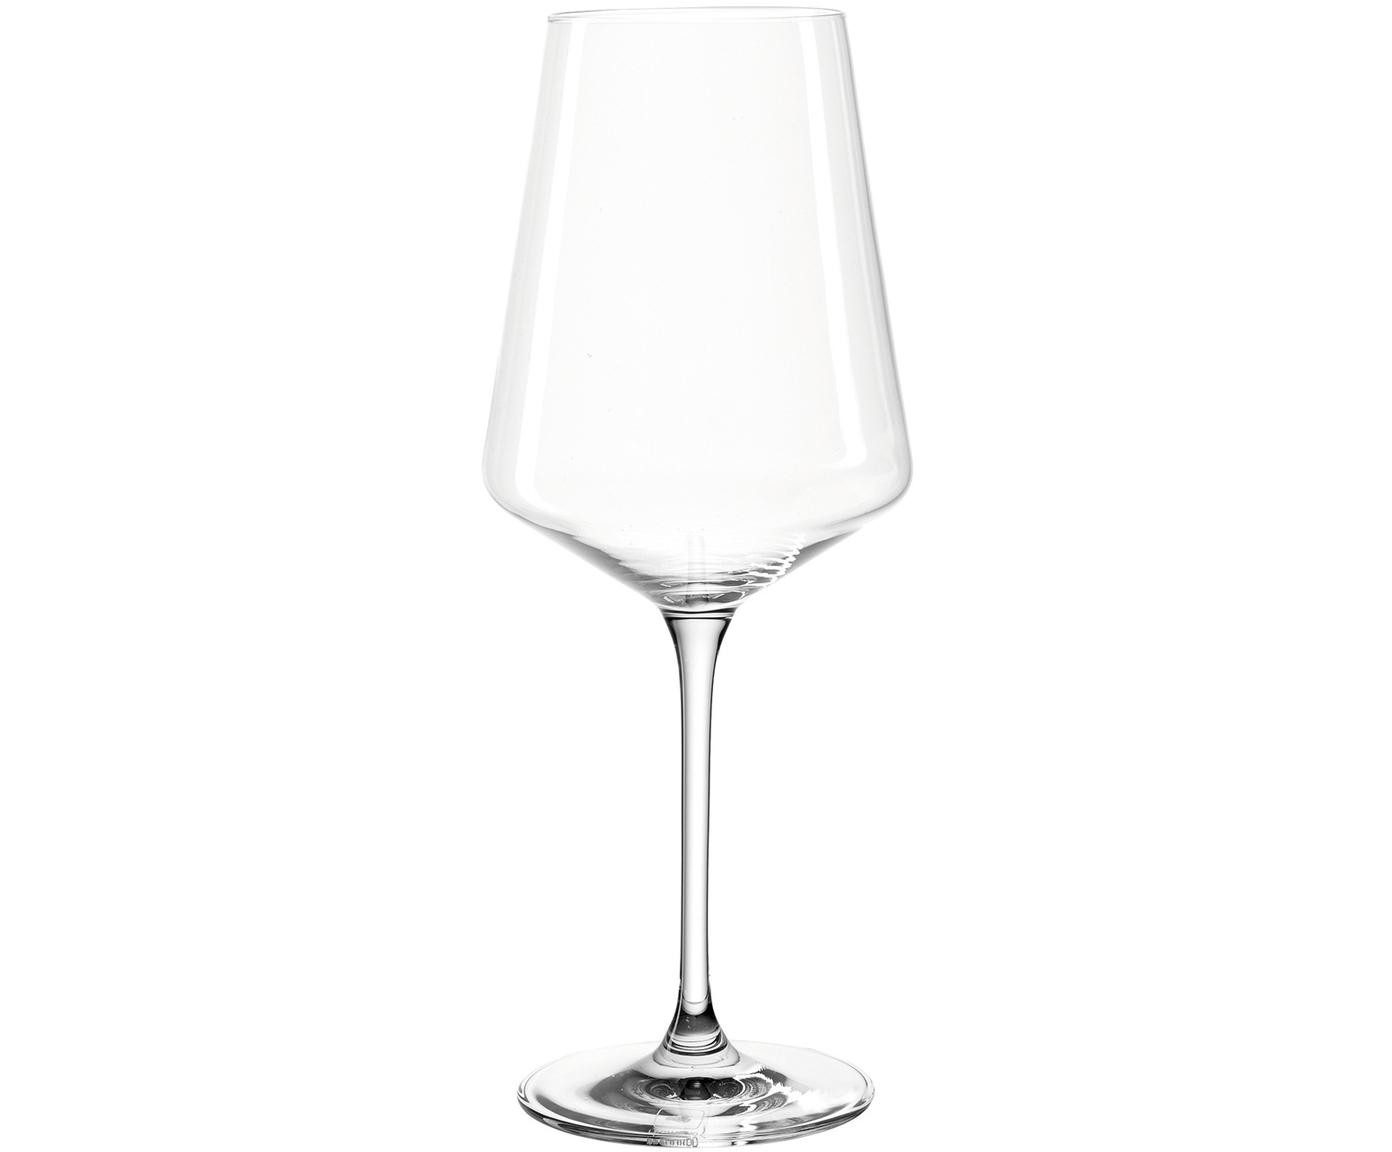 Copas de vino blanco Puccini, 6uds., Vidrio Teqton®, Transparente, Ø 10 x Al 24 cm